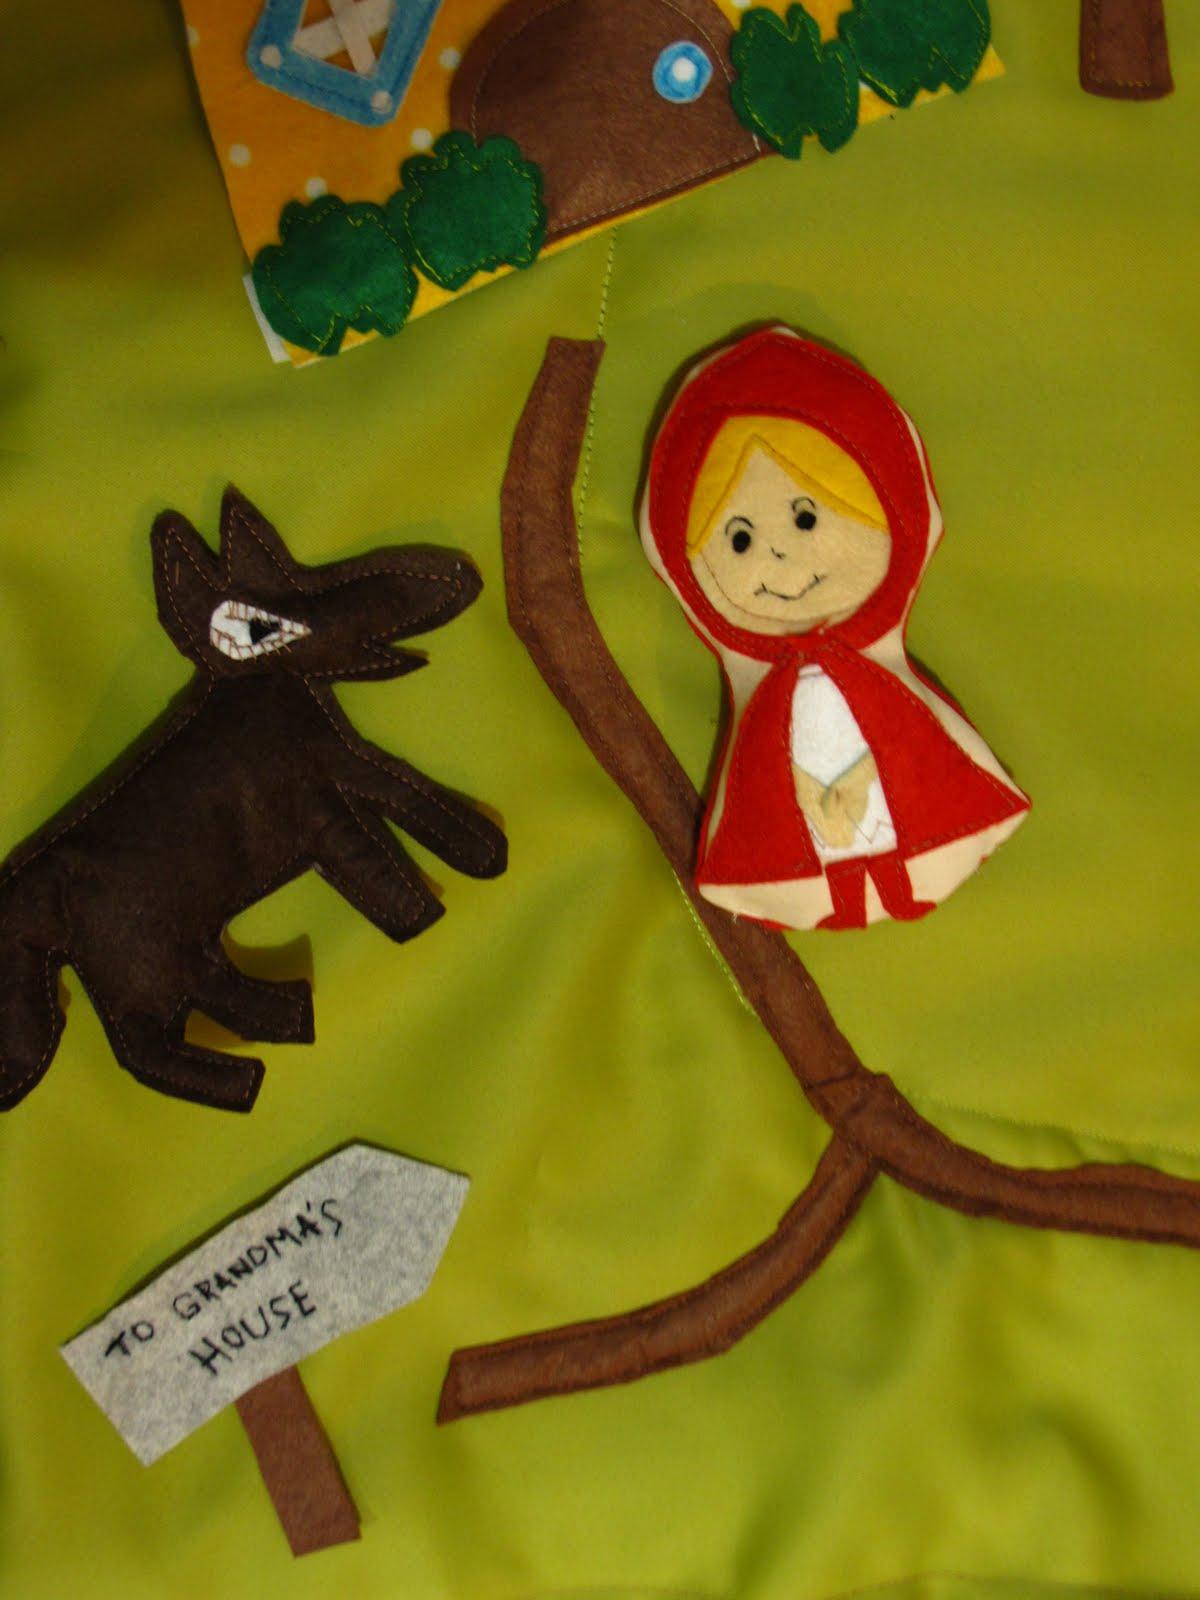 http://1.bp.blogspot.com/_OJ4SpiZKous/S_uJiQ9SGoI/AAAAAAAAAPk/S3YHOBnwEF0/s1600/Play+mat+Fairy+Tale+135.JPG